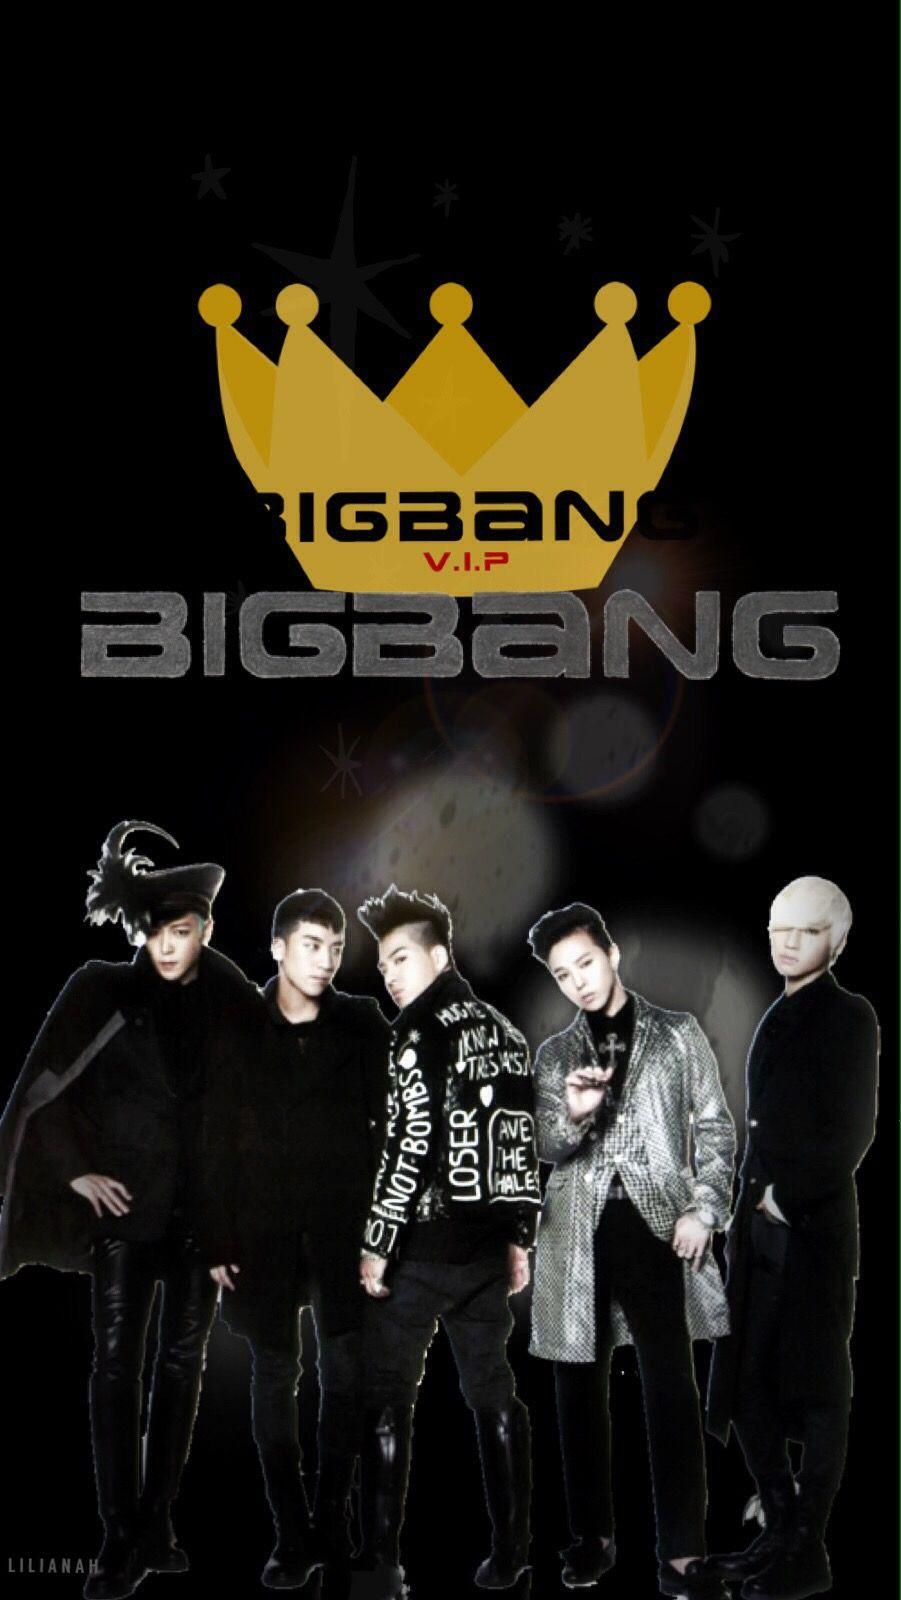 Bigbang Iphone Wallpaper Made By Lilianah Bigbang Vip Bigbang 壁紙 ビッグバン ビックバン